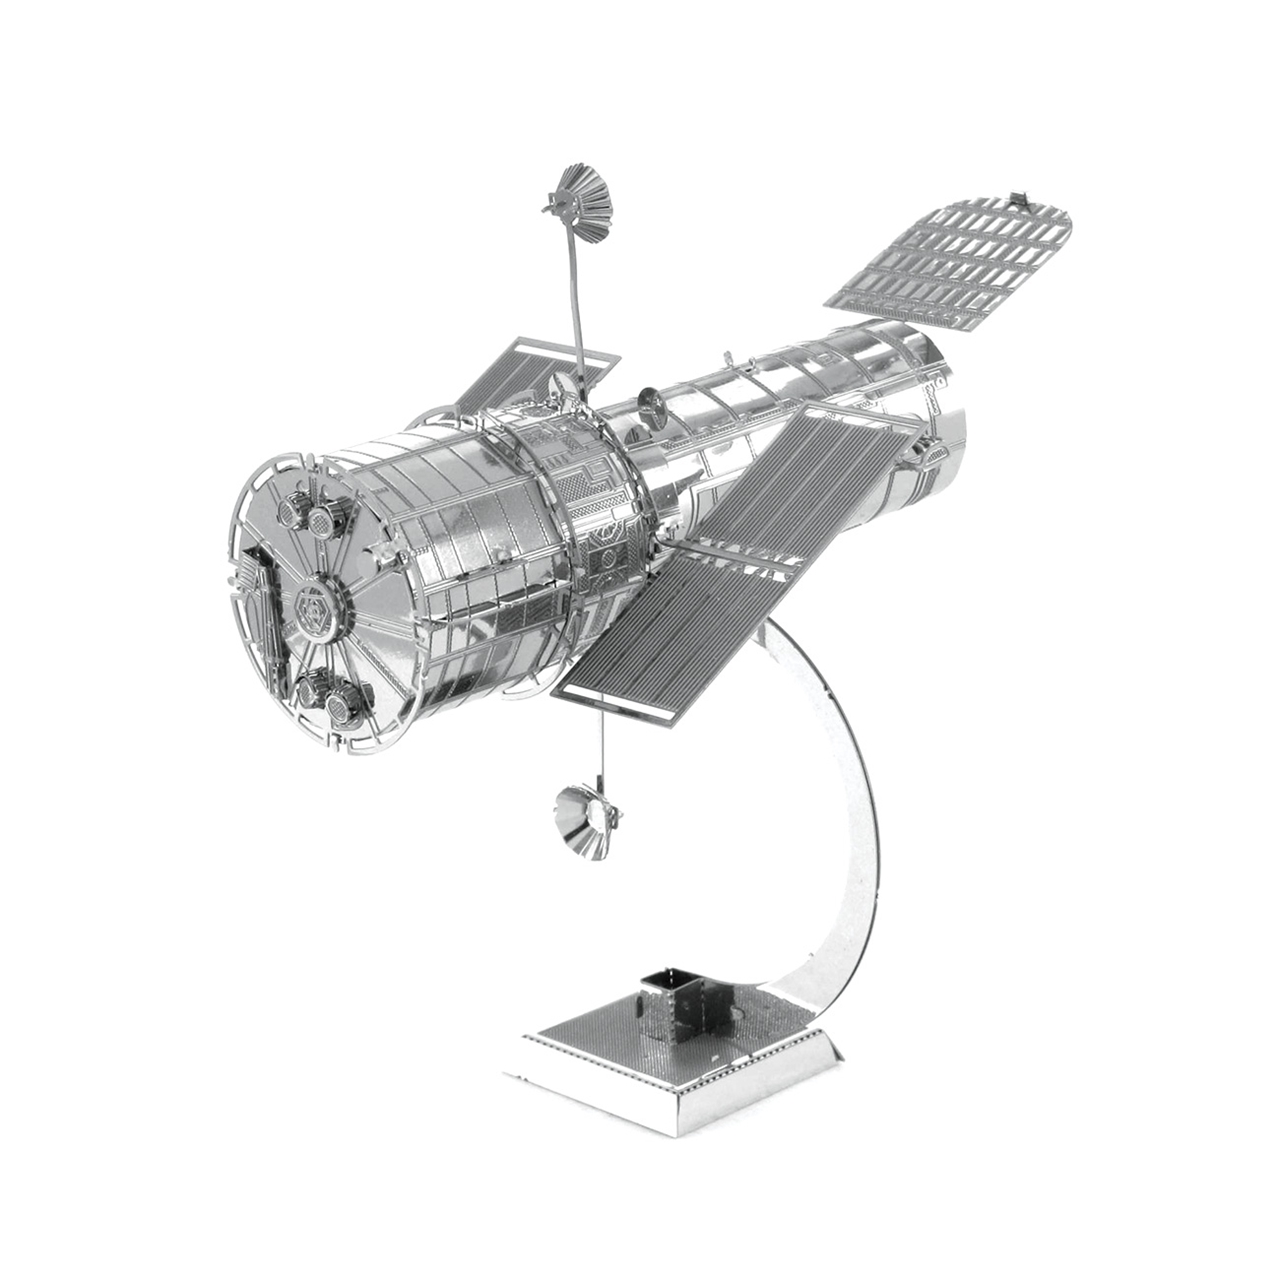 hubble telescope 3d model - photo #35